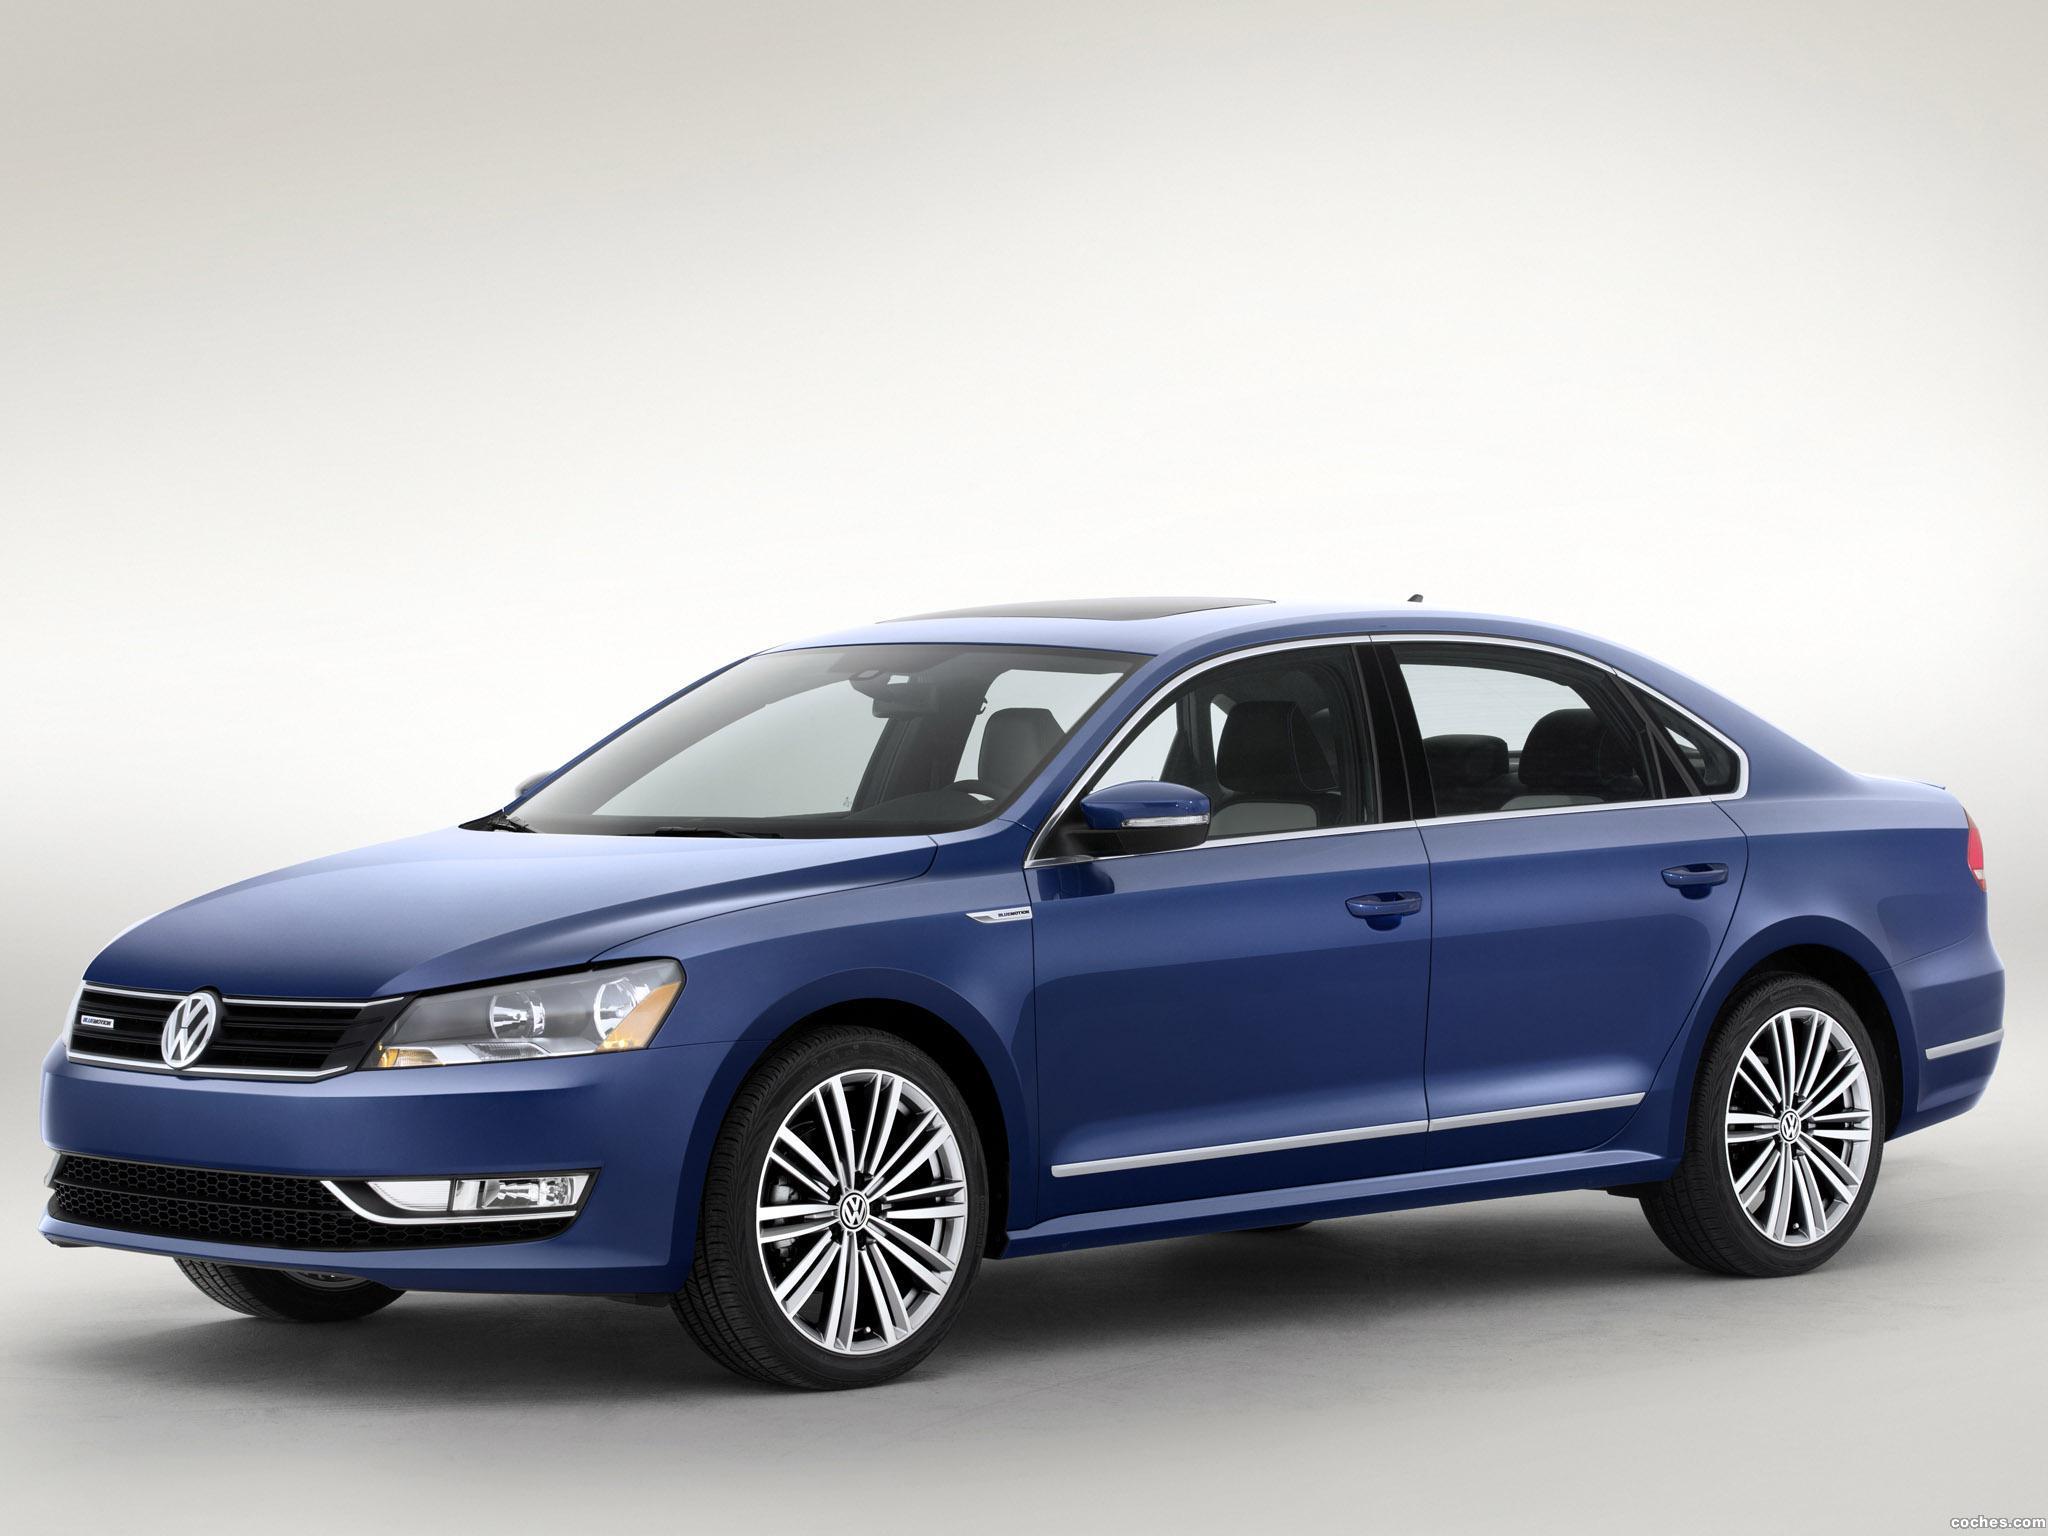 Foto 0 de Volkswagen Passat Bluemotion Concept 2014